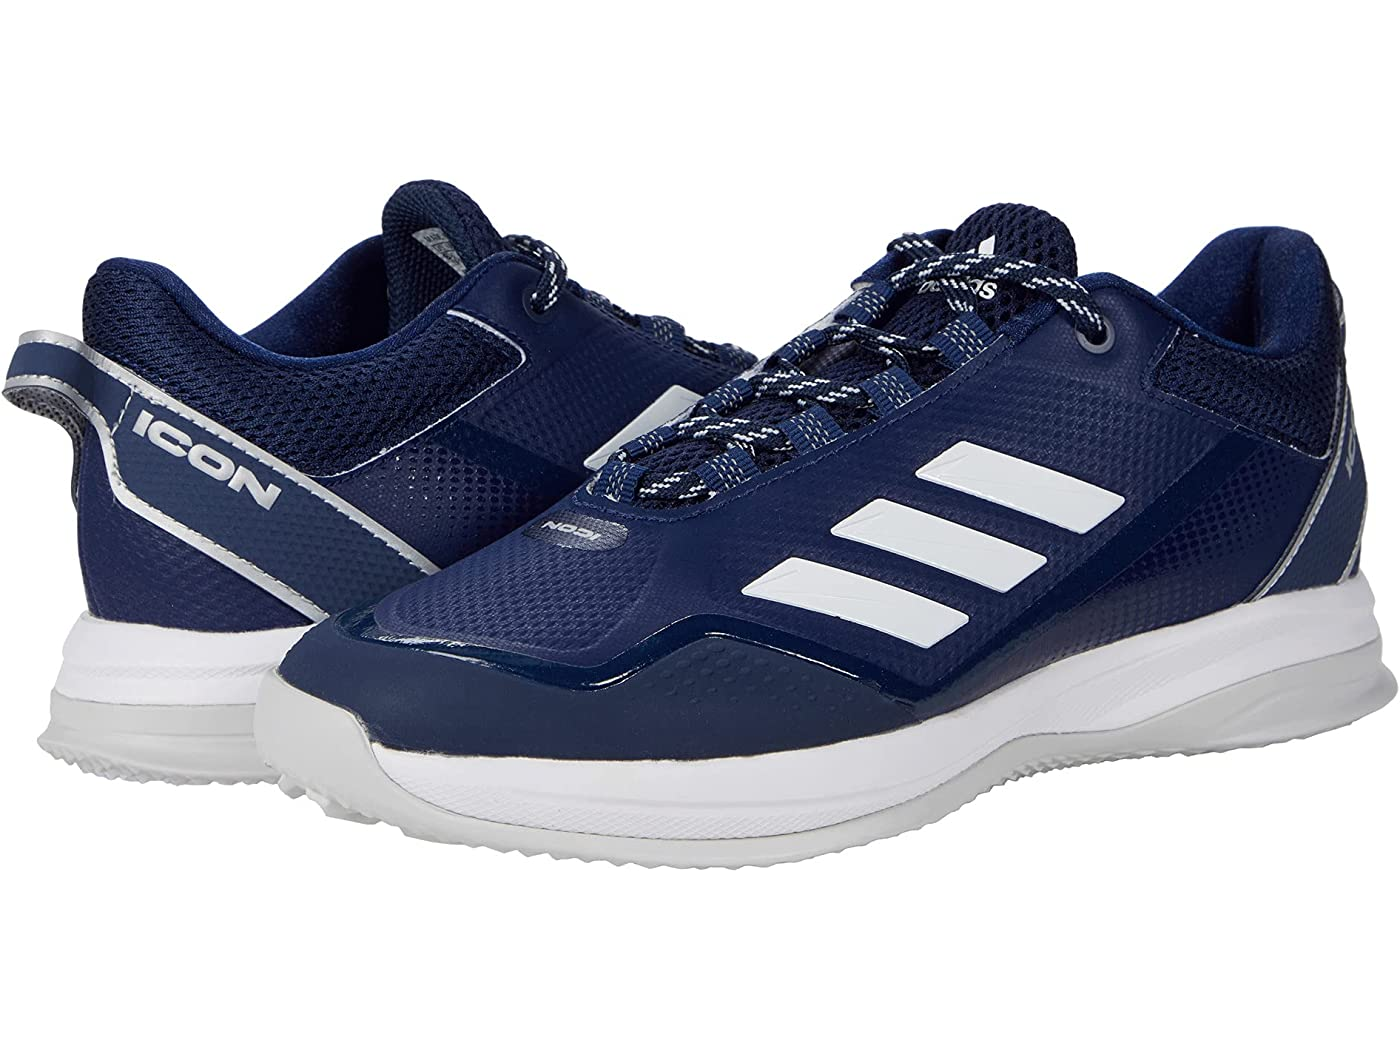 Adidas Icon 7 Turf Baseball Cleats